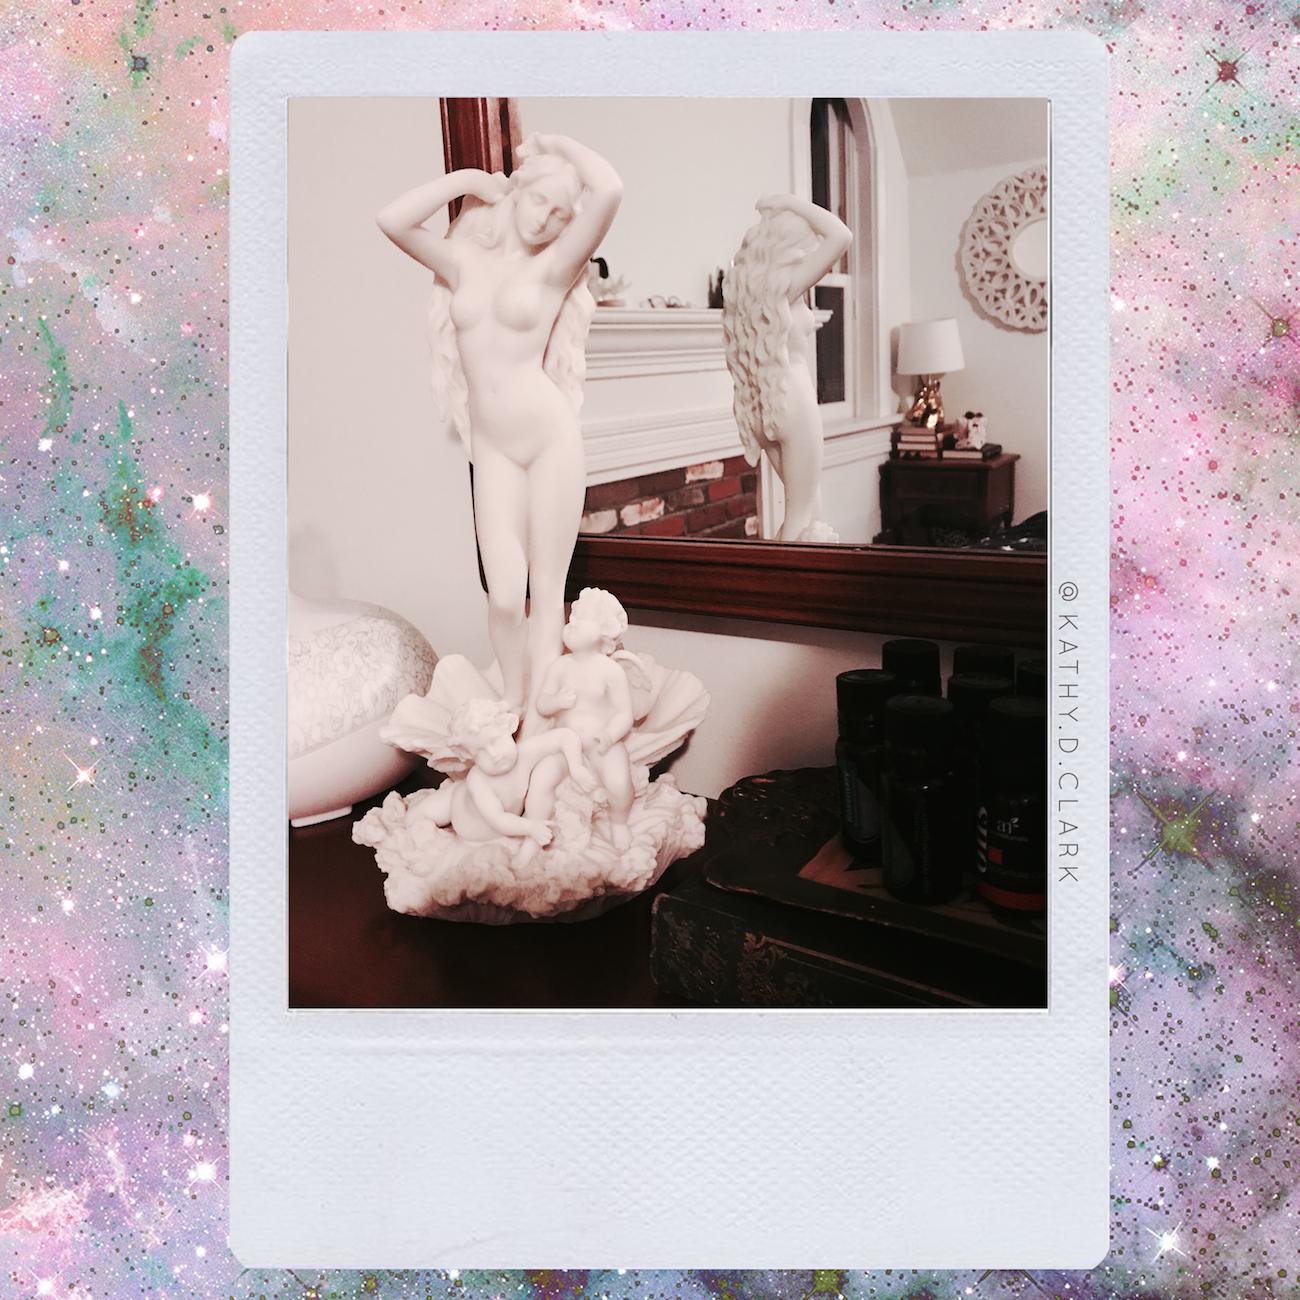 kathy-d-clark-laceandwhimsy-venus-statue-room-photo.PNG